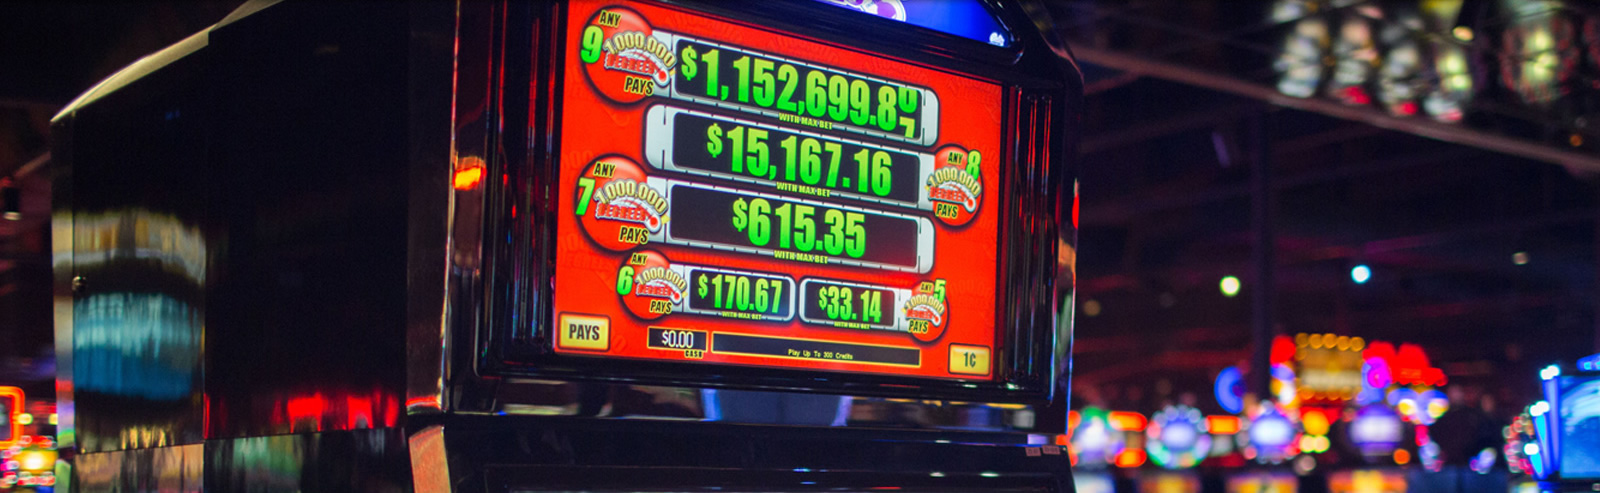 casinos in northern oklahoma